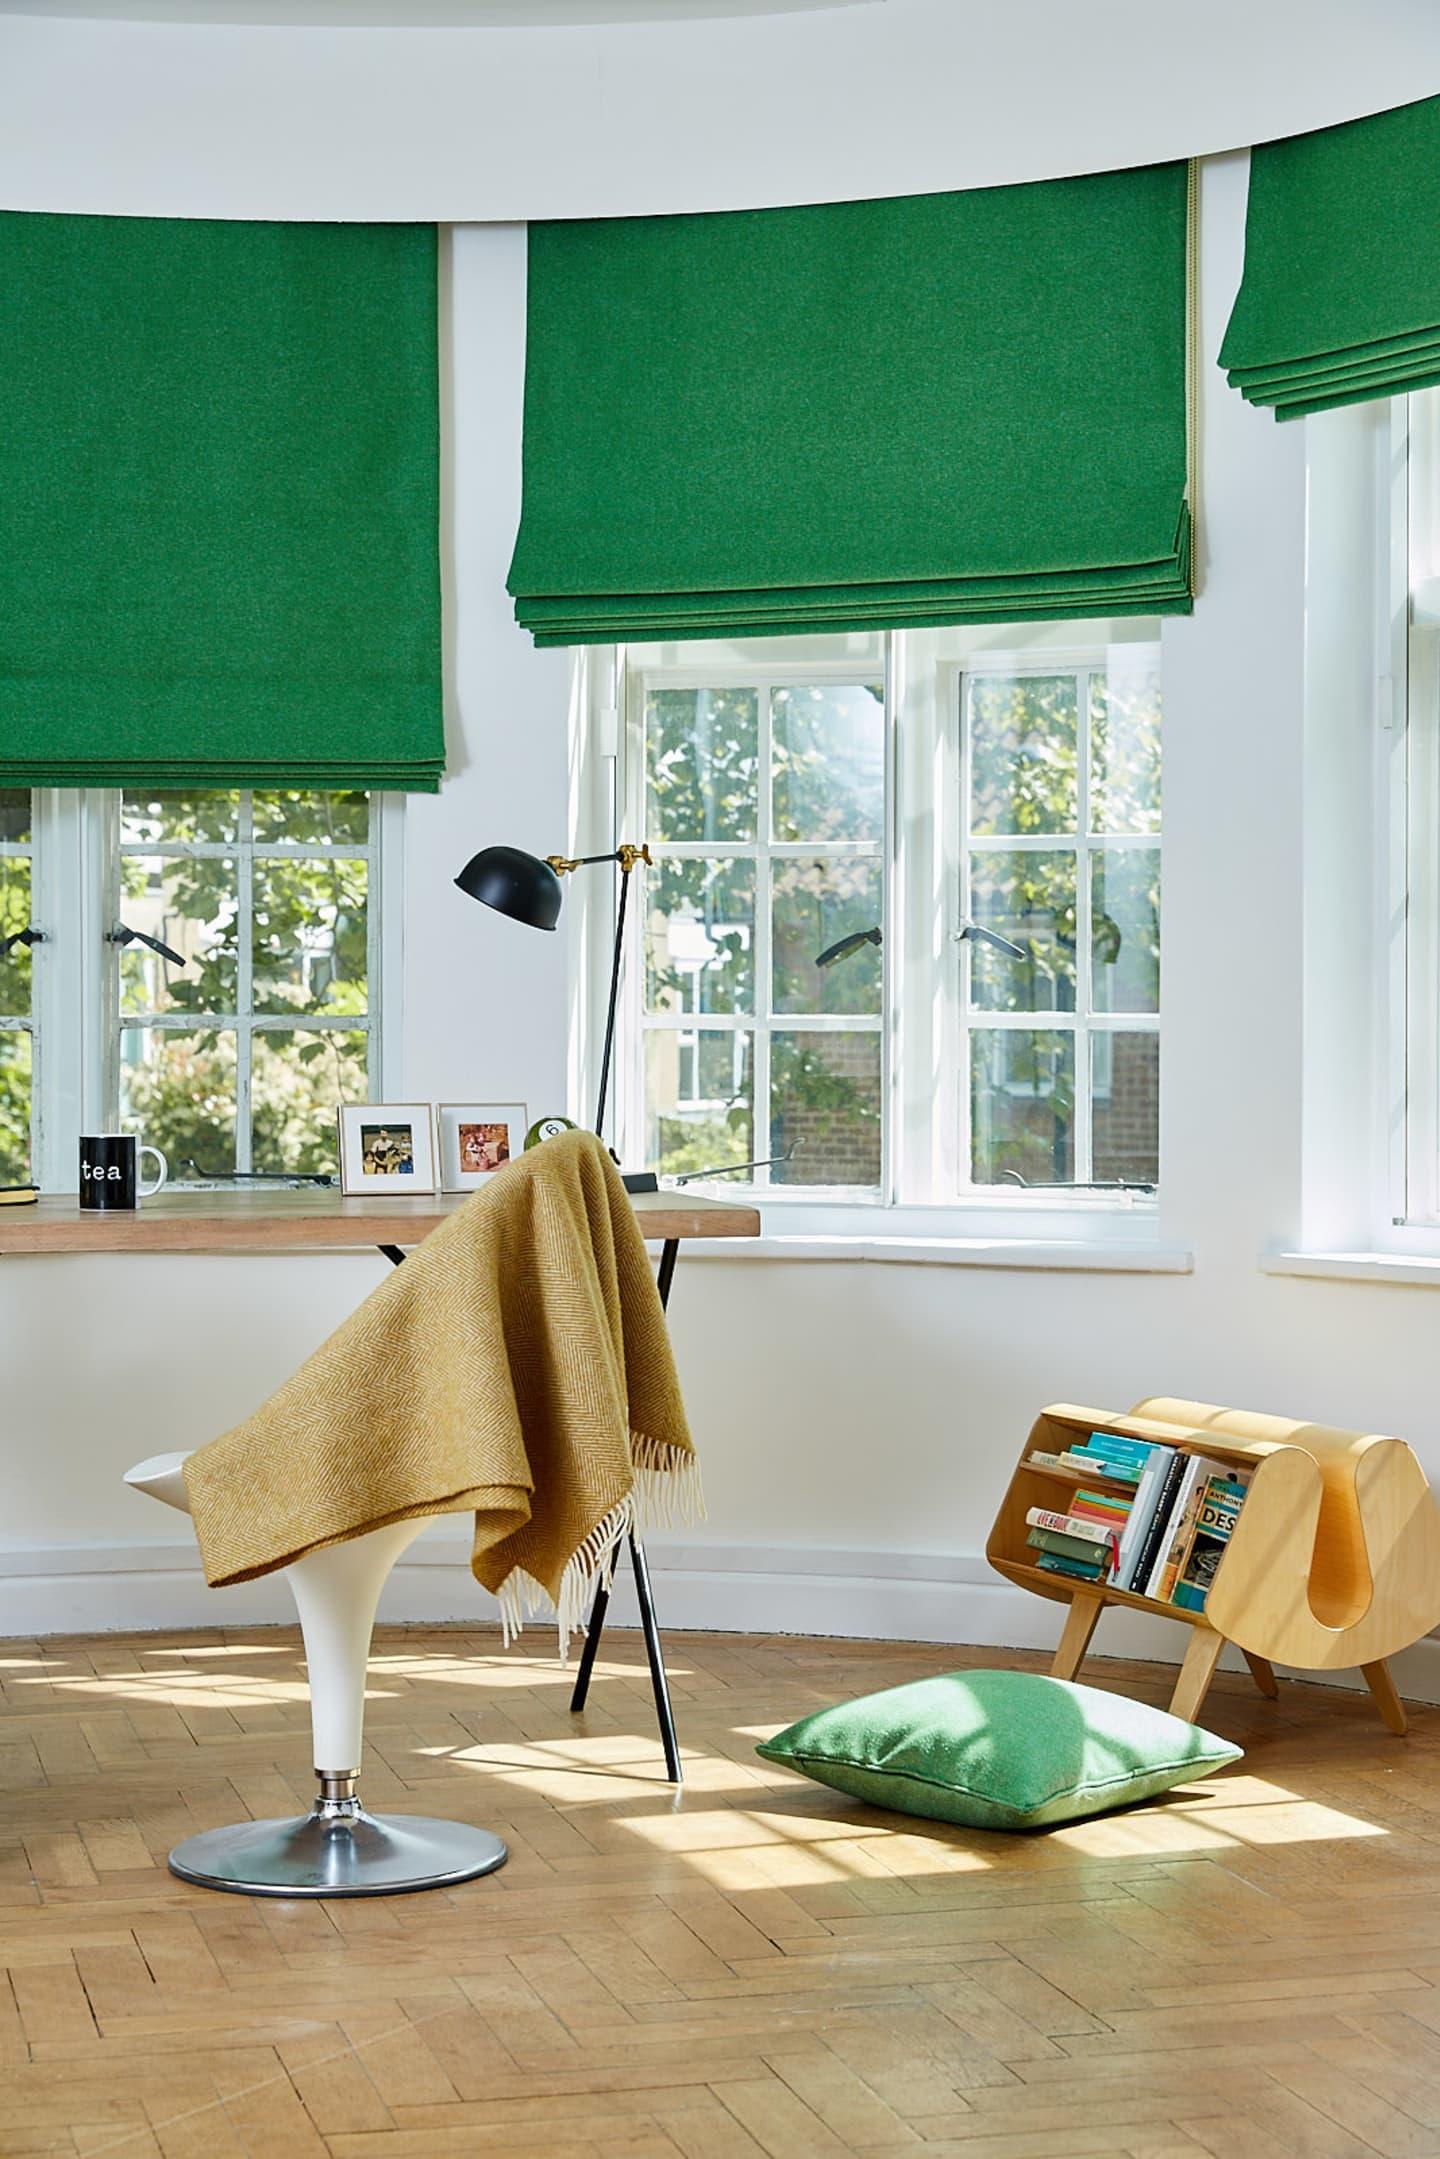 study desk facing windows and green wool roman blinds